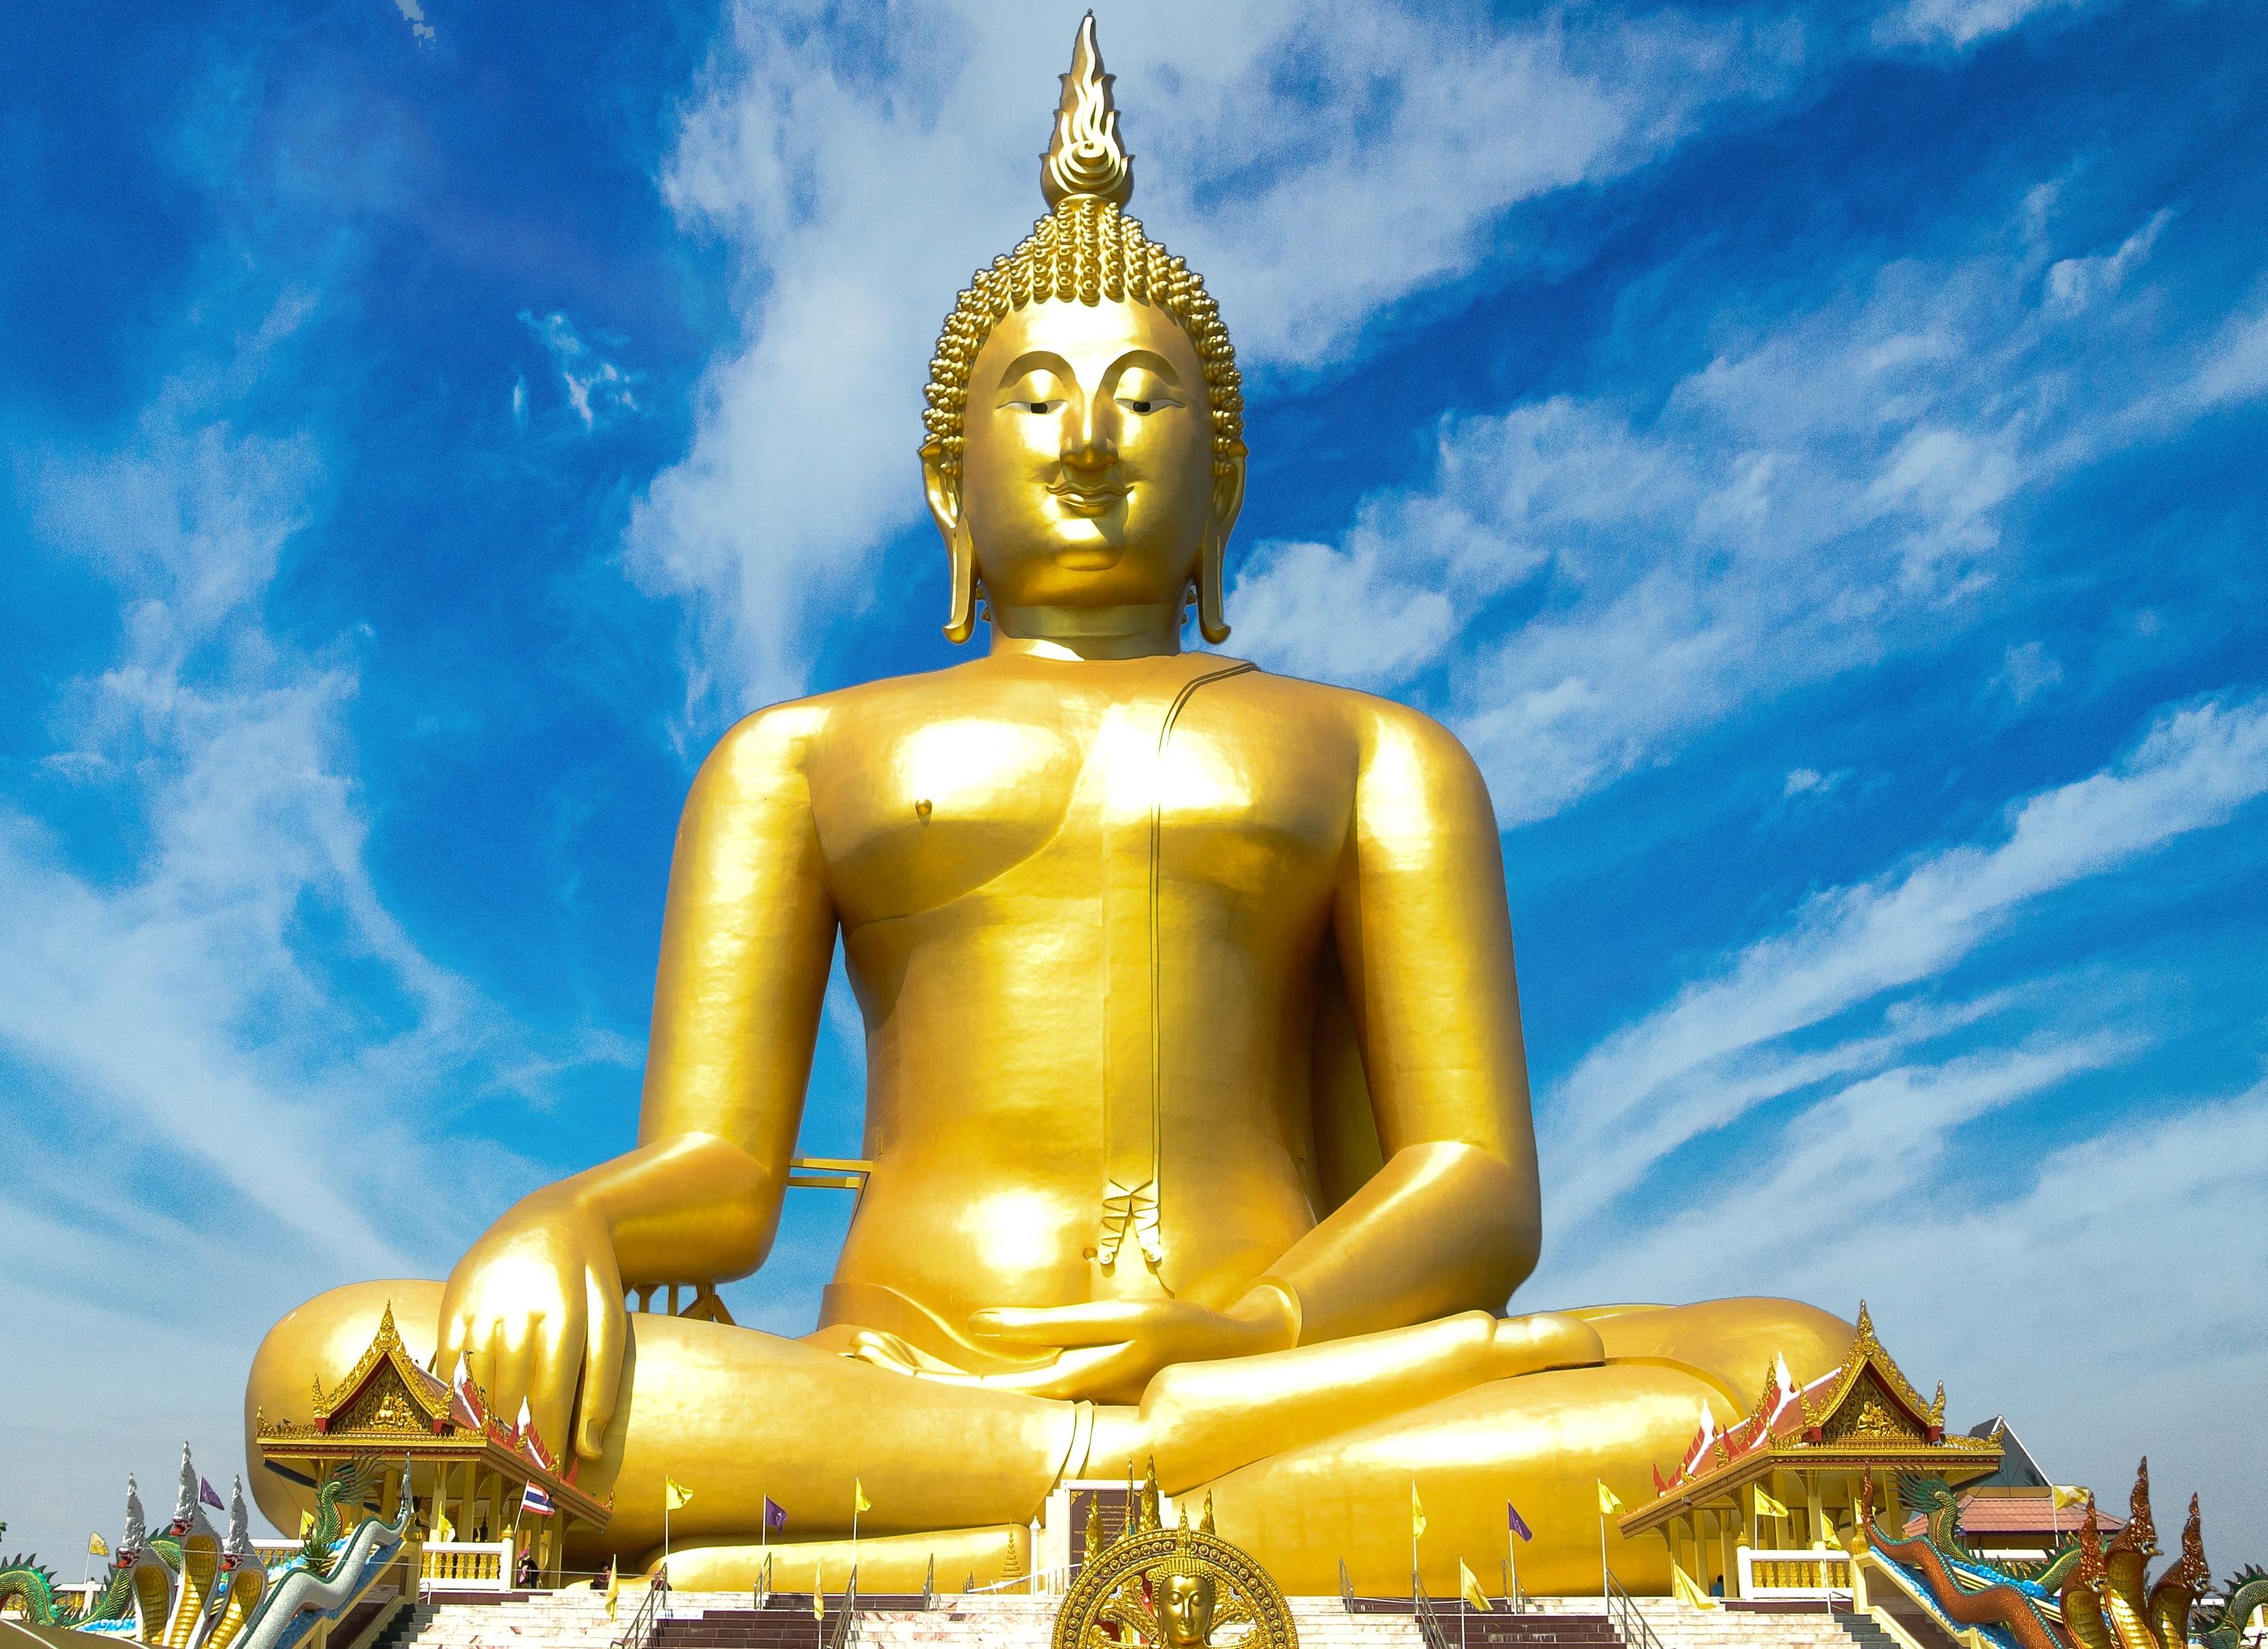 Golden Buddha Statue, Buddha, Buddhism, Golden, Religion, HQ Photo